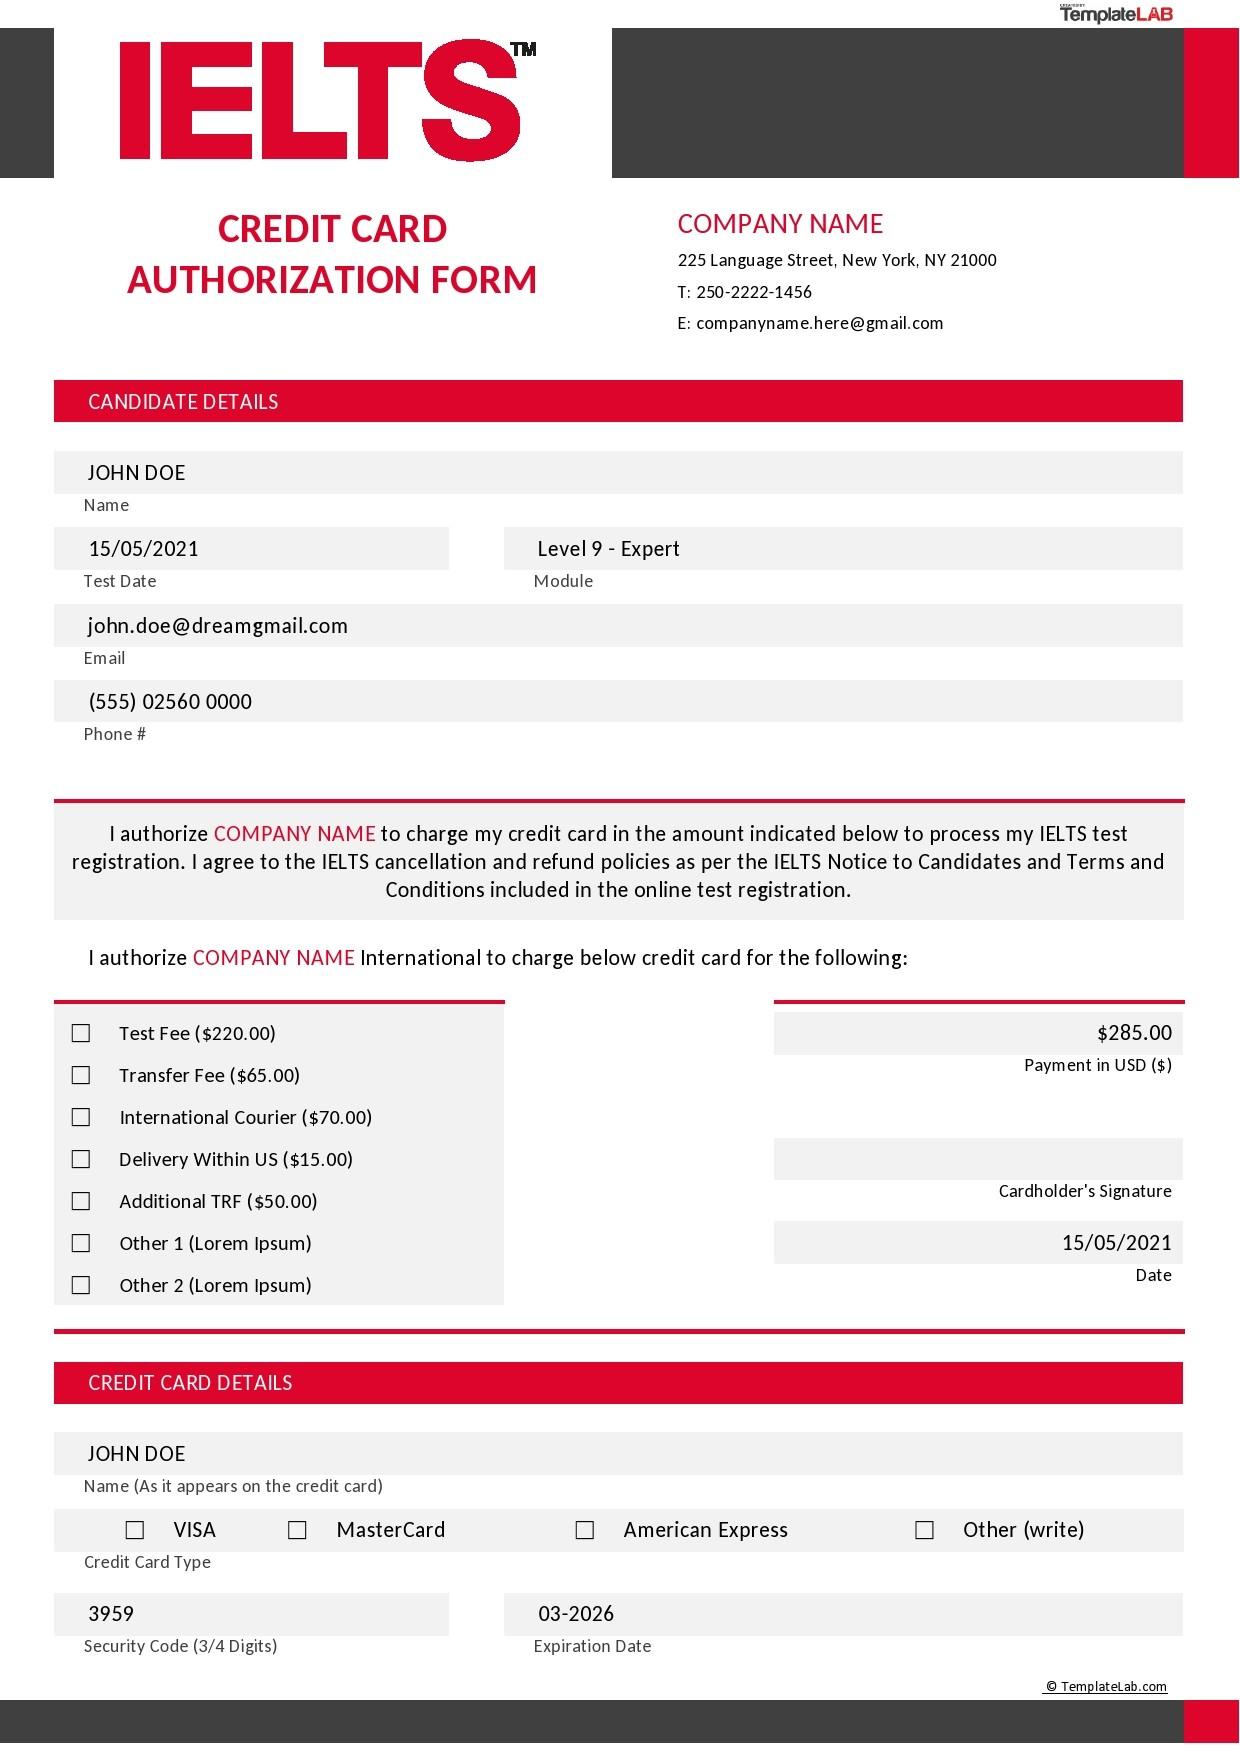 Free IELTS Credit Card Authorization Form - TemplateLab.com